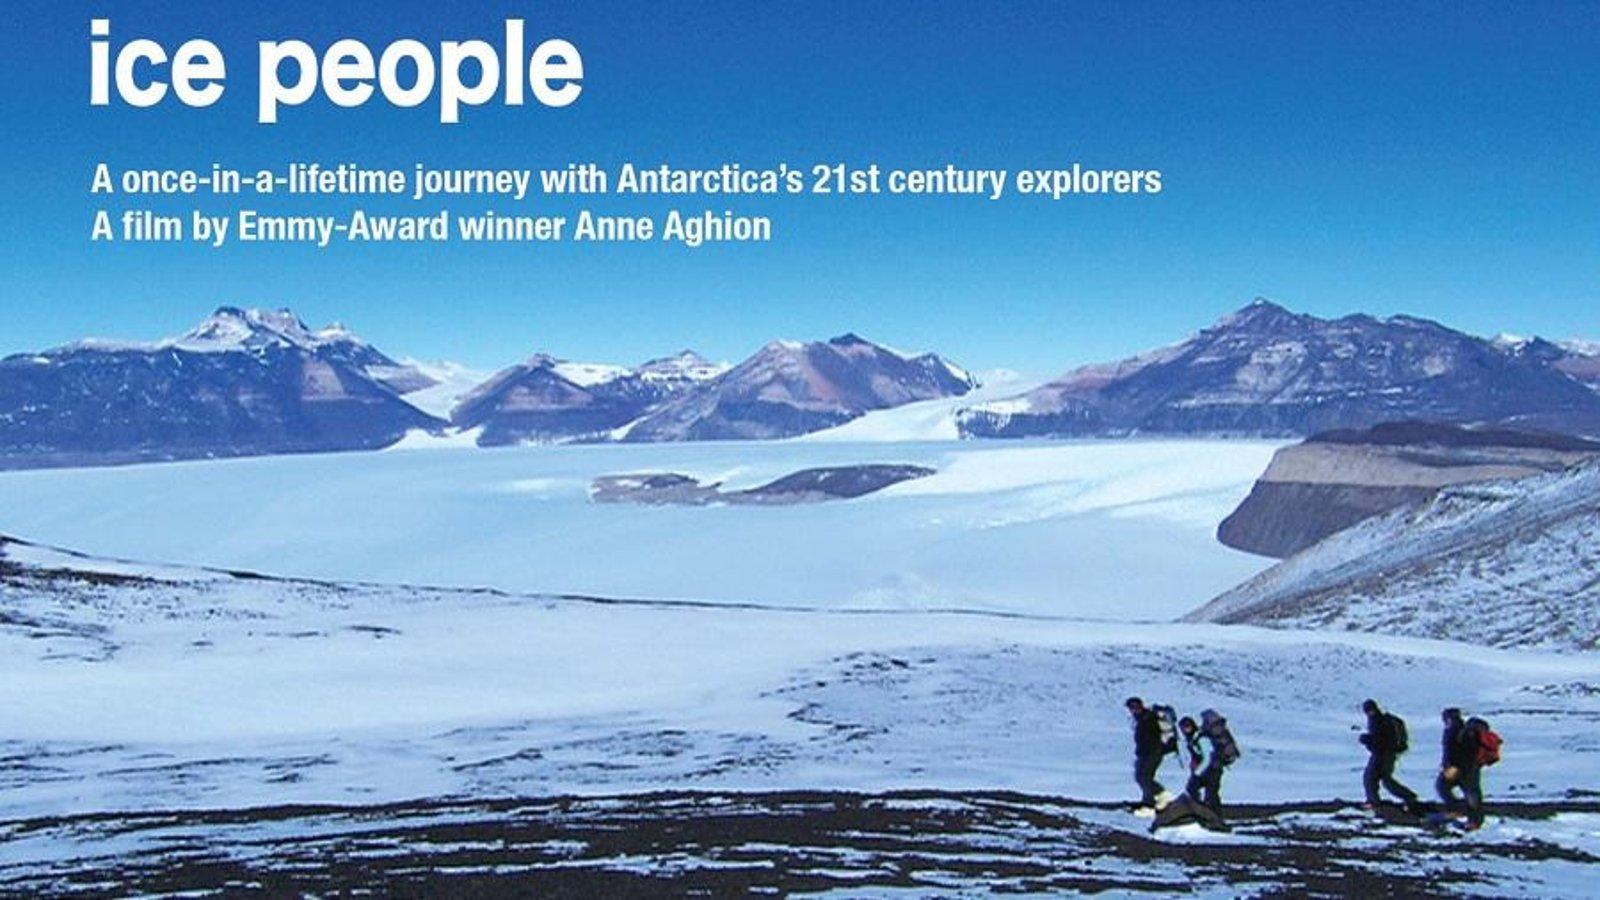 Ice People - Following Antarctica's 21st Century Explorers